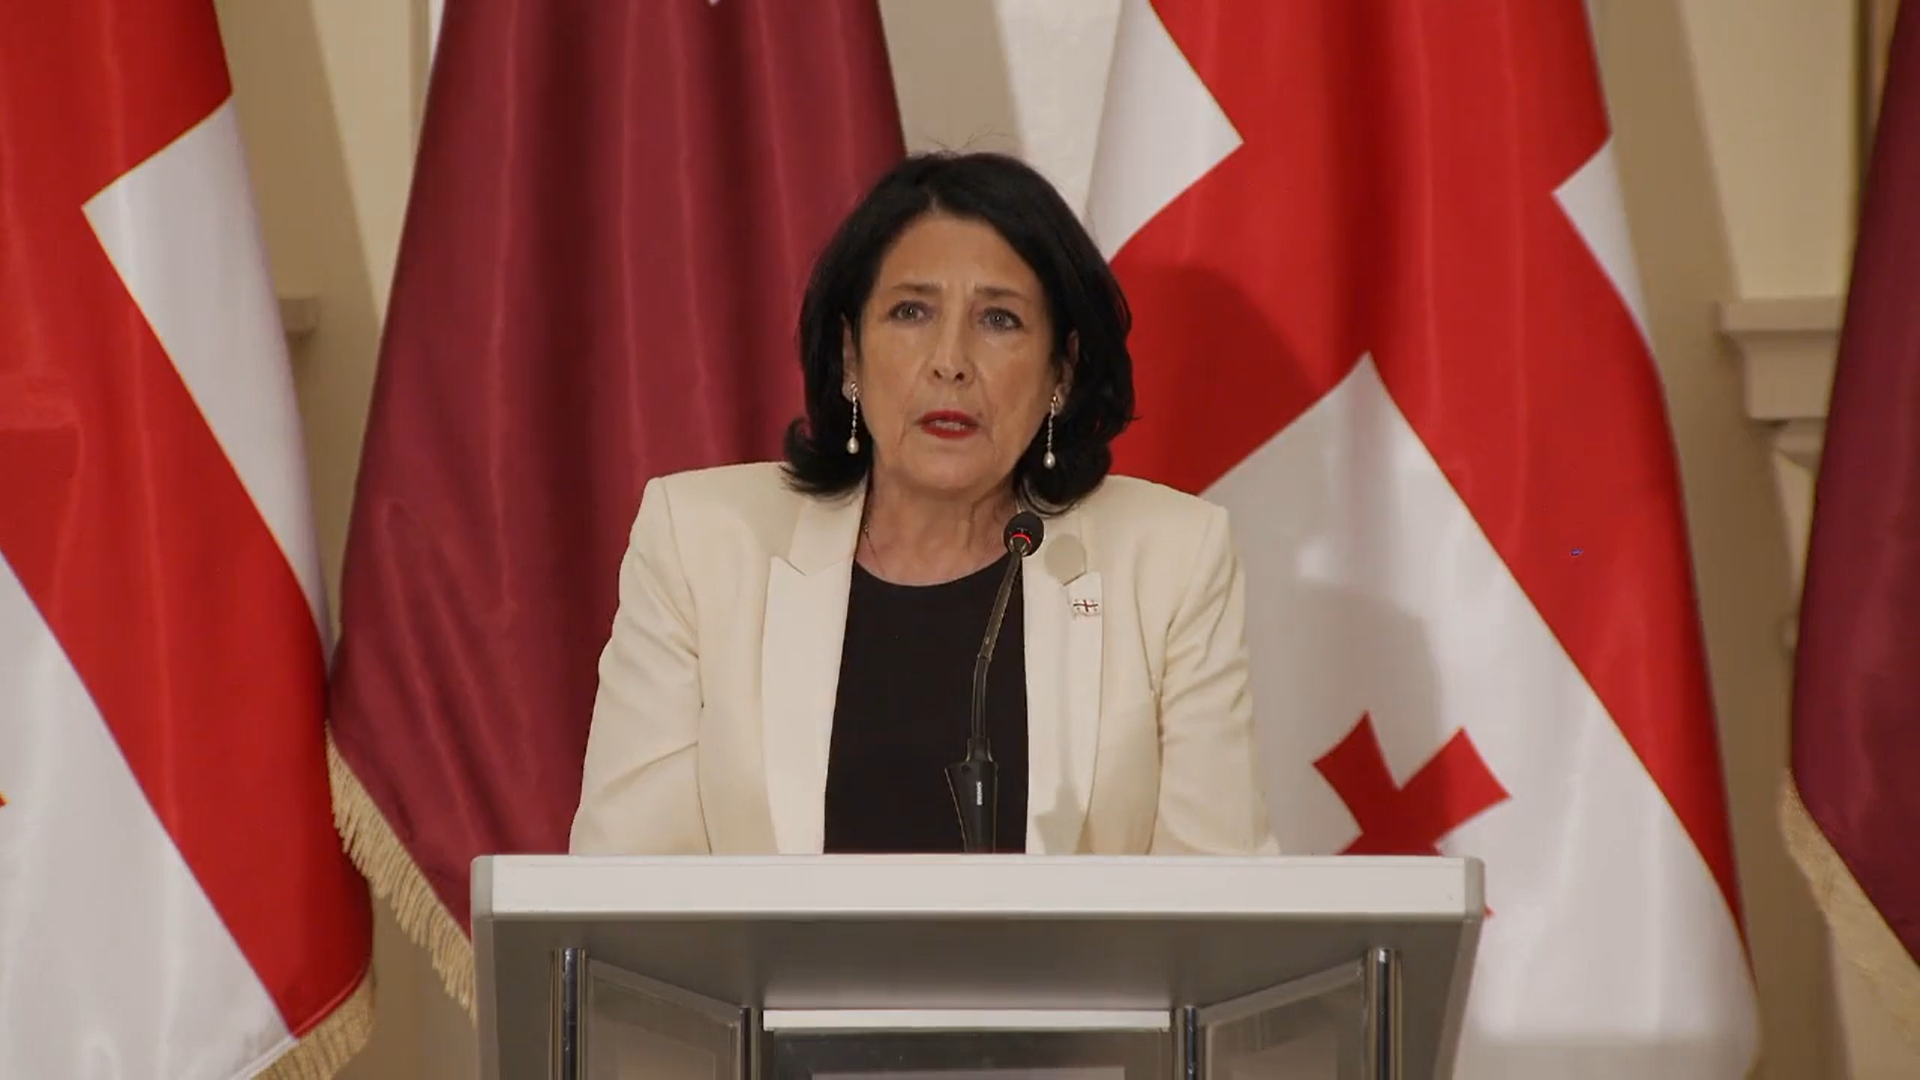 Salome Zourabishvili 421 #новости Президент Грузии, Саломе Зурабишвили